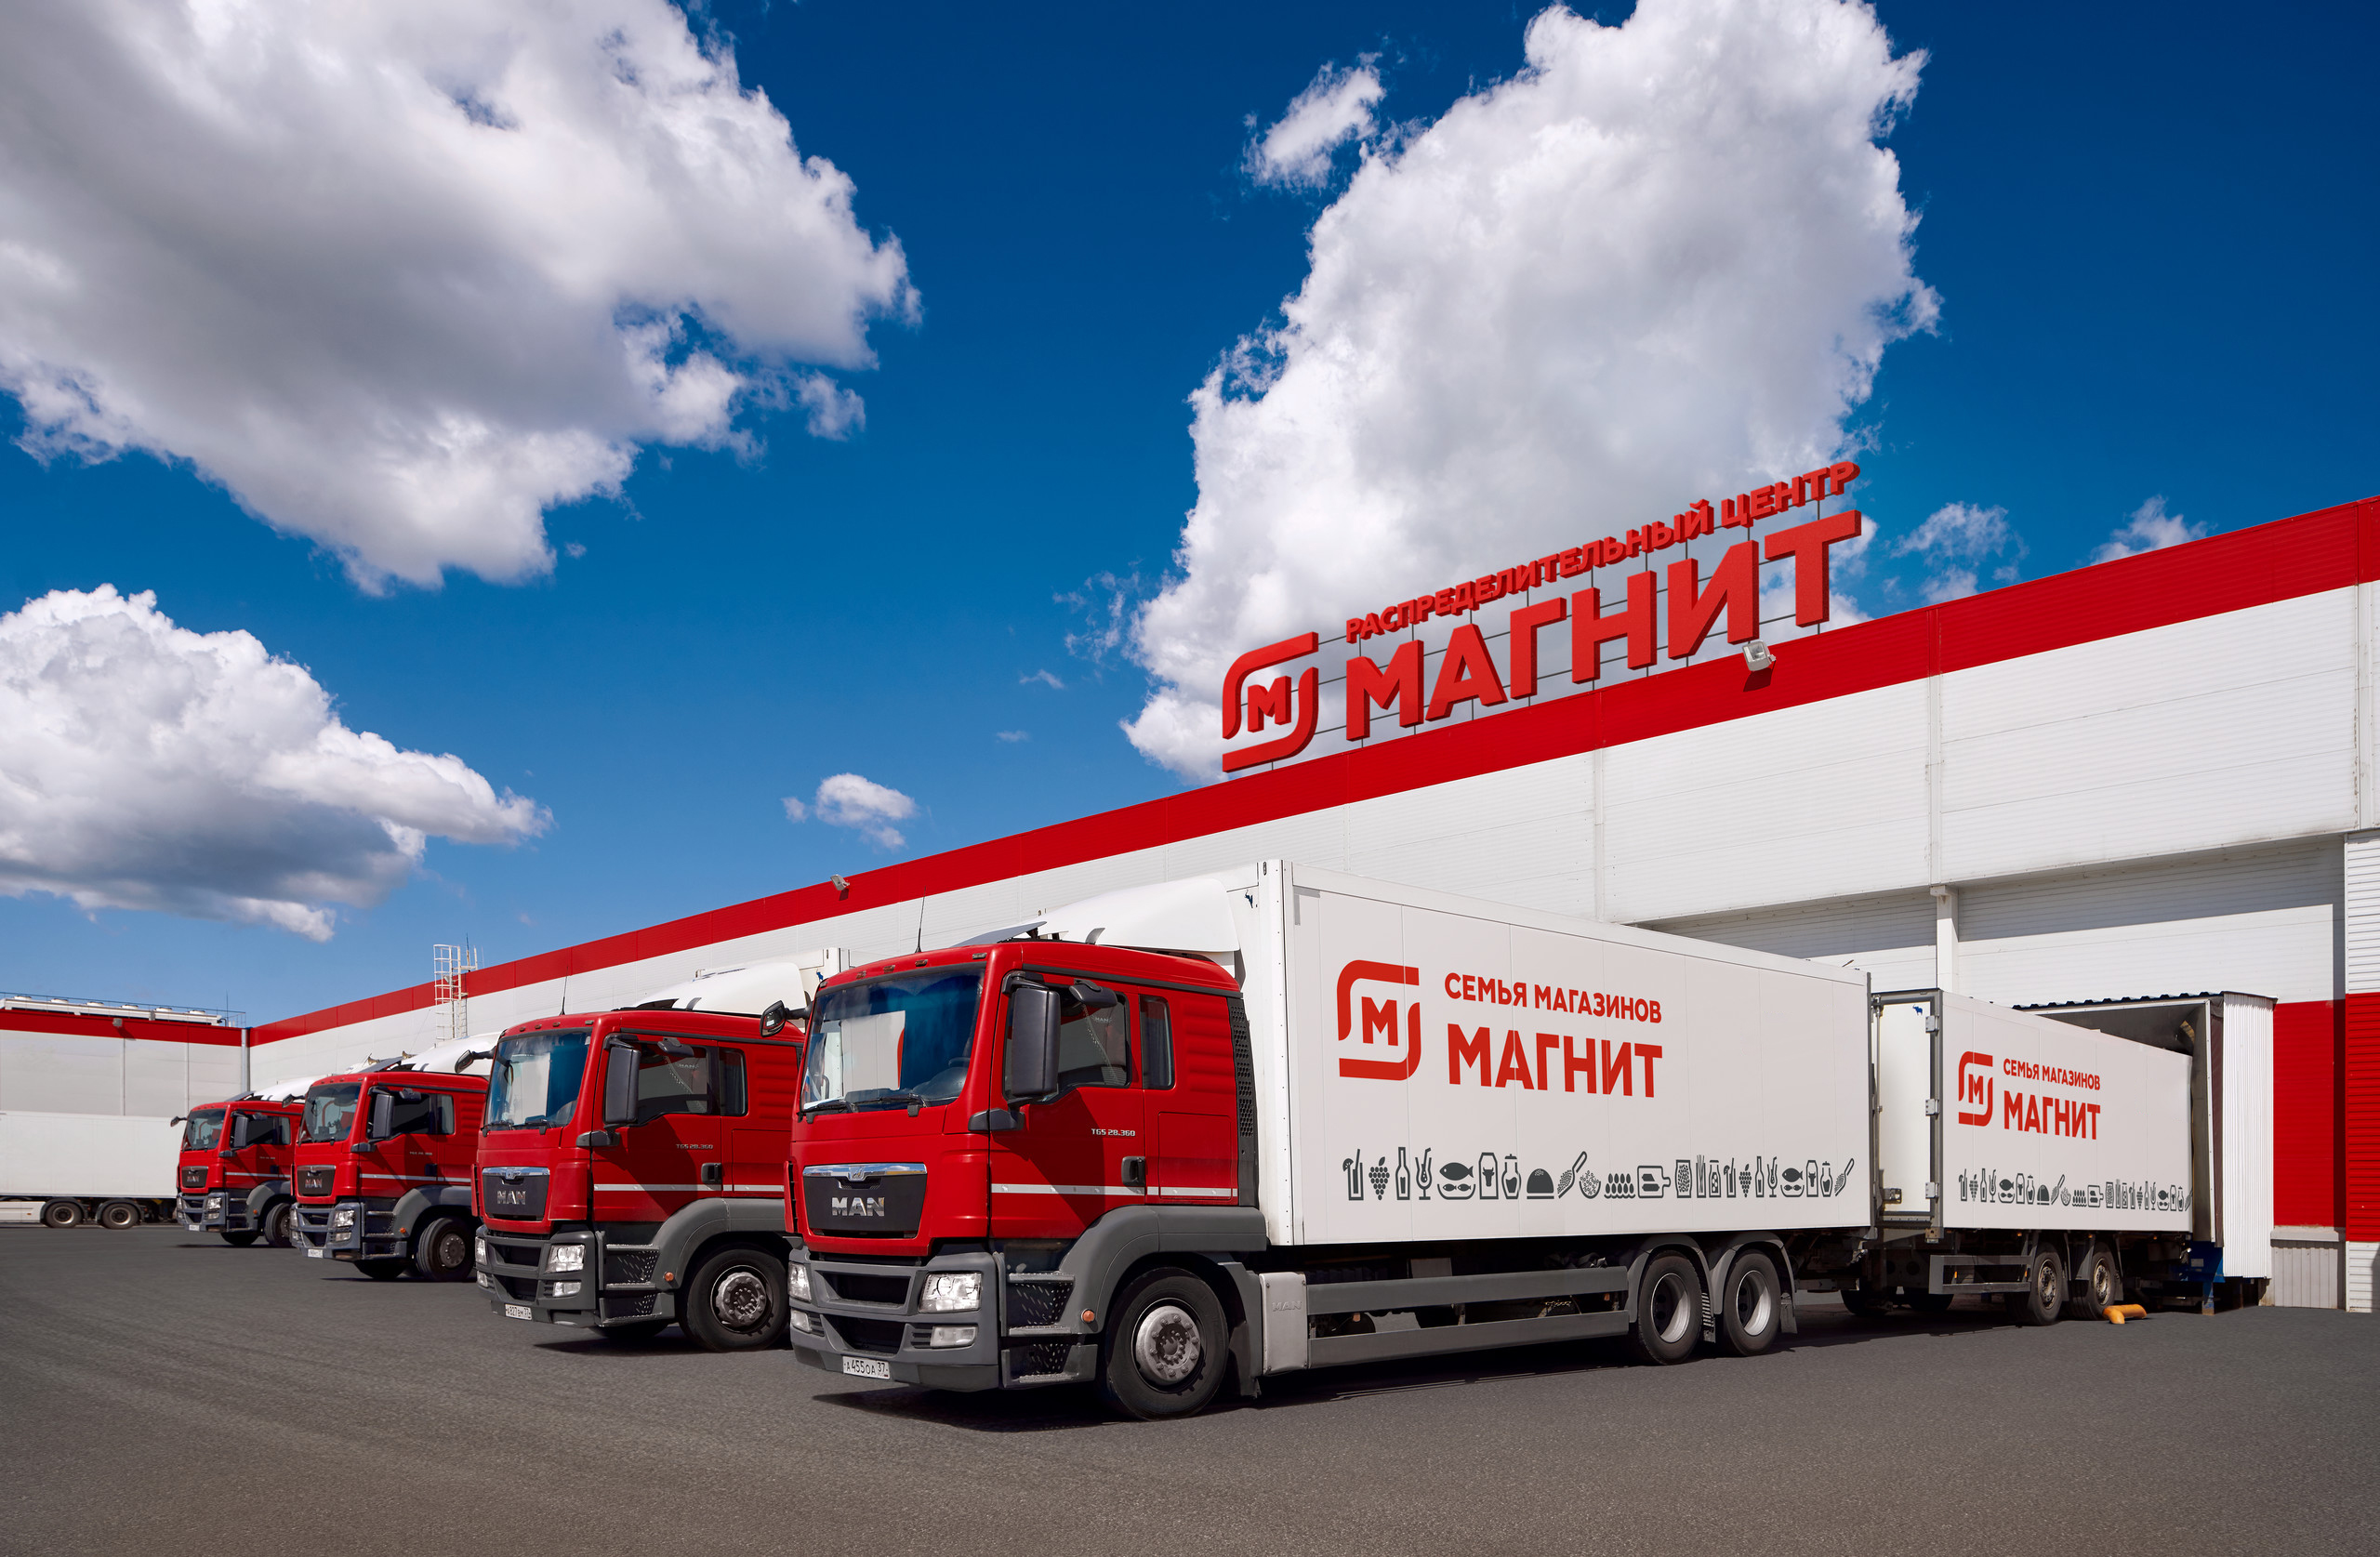 Компания «ЛЛК-Интернешнл» и ритейлер «Магнит» отмечают 10-летний юбилей сотрудничества